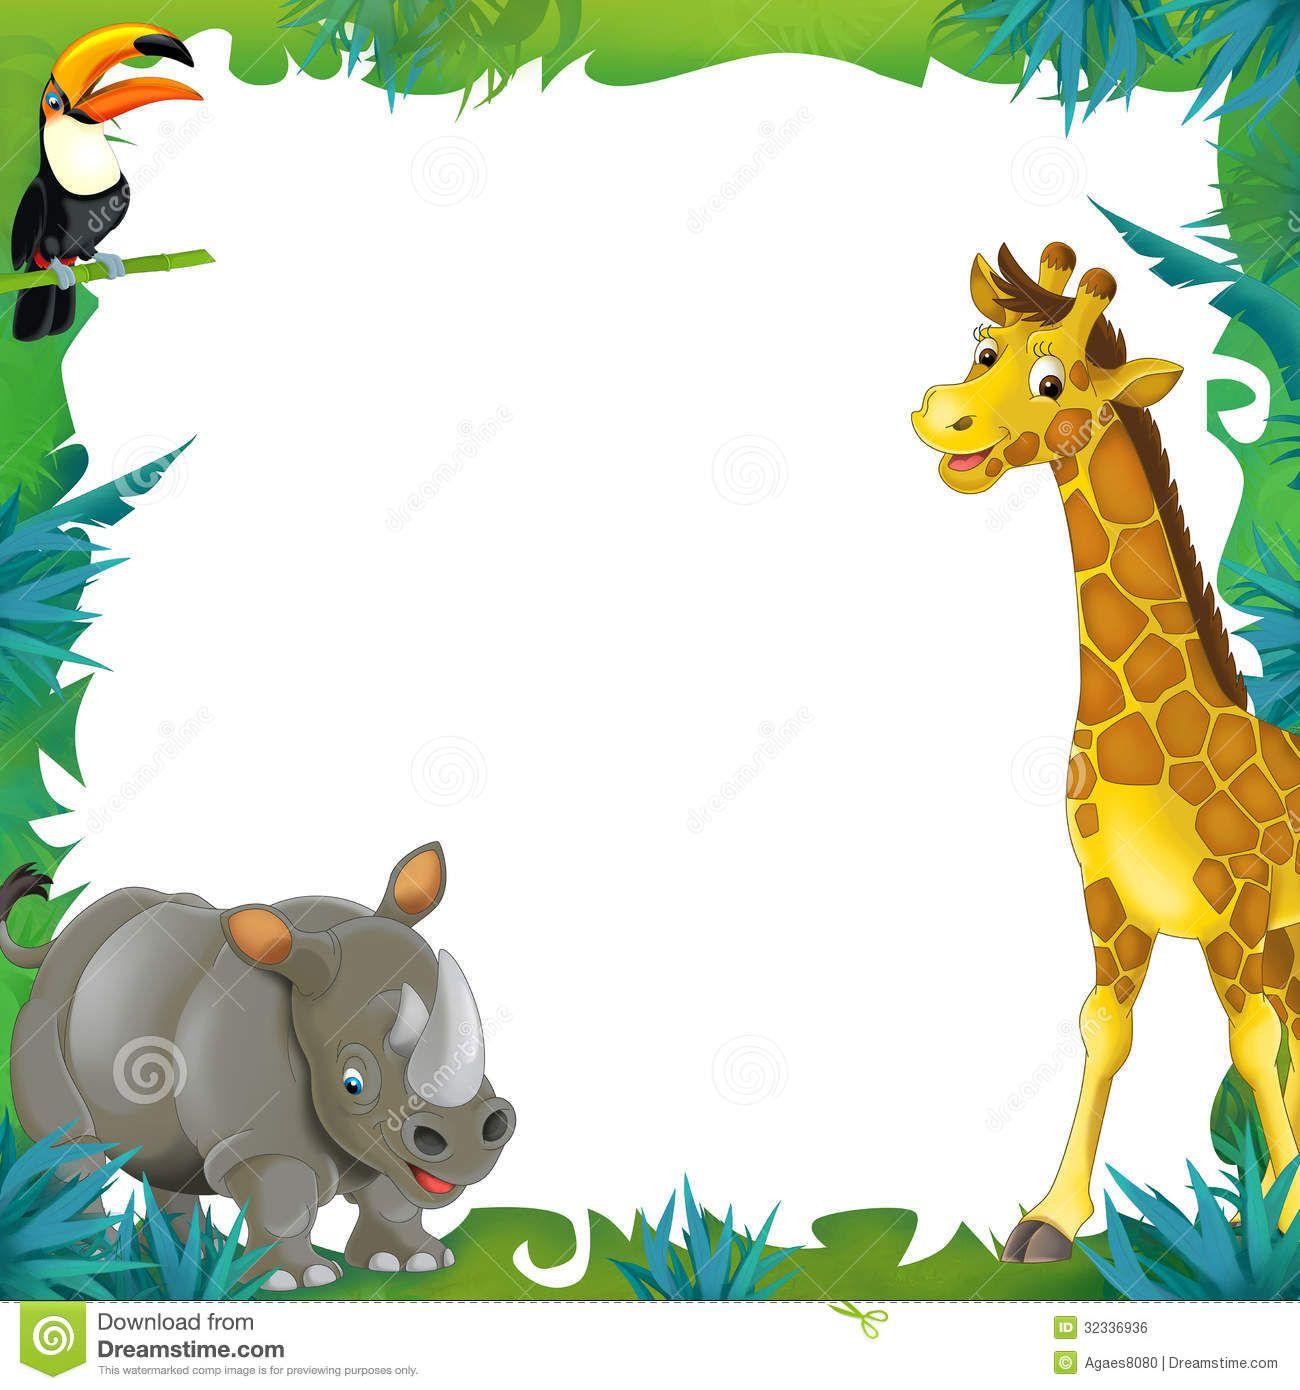 Cartoon Safari - Jungle - Frame Border Template ...